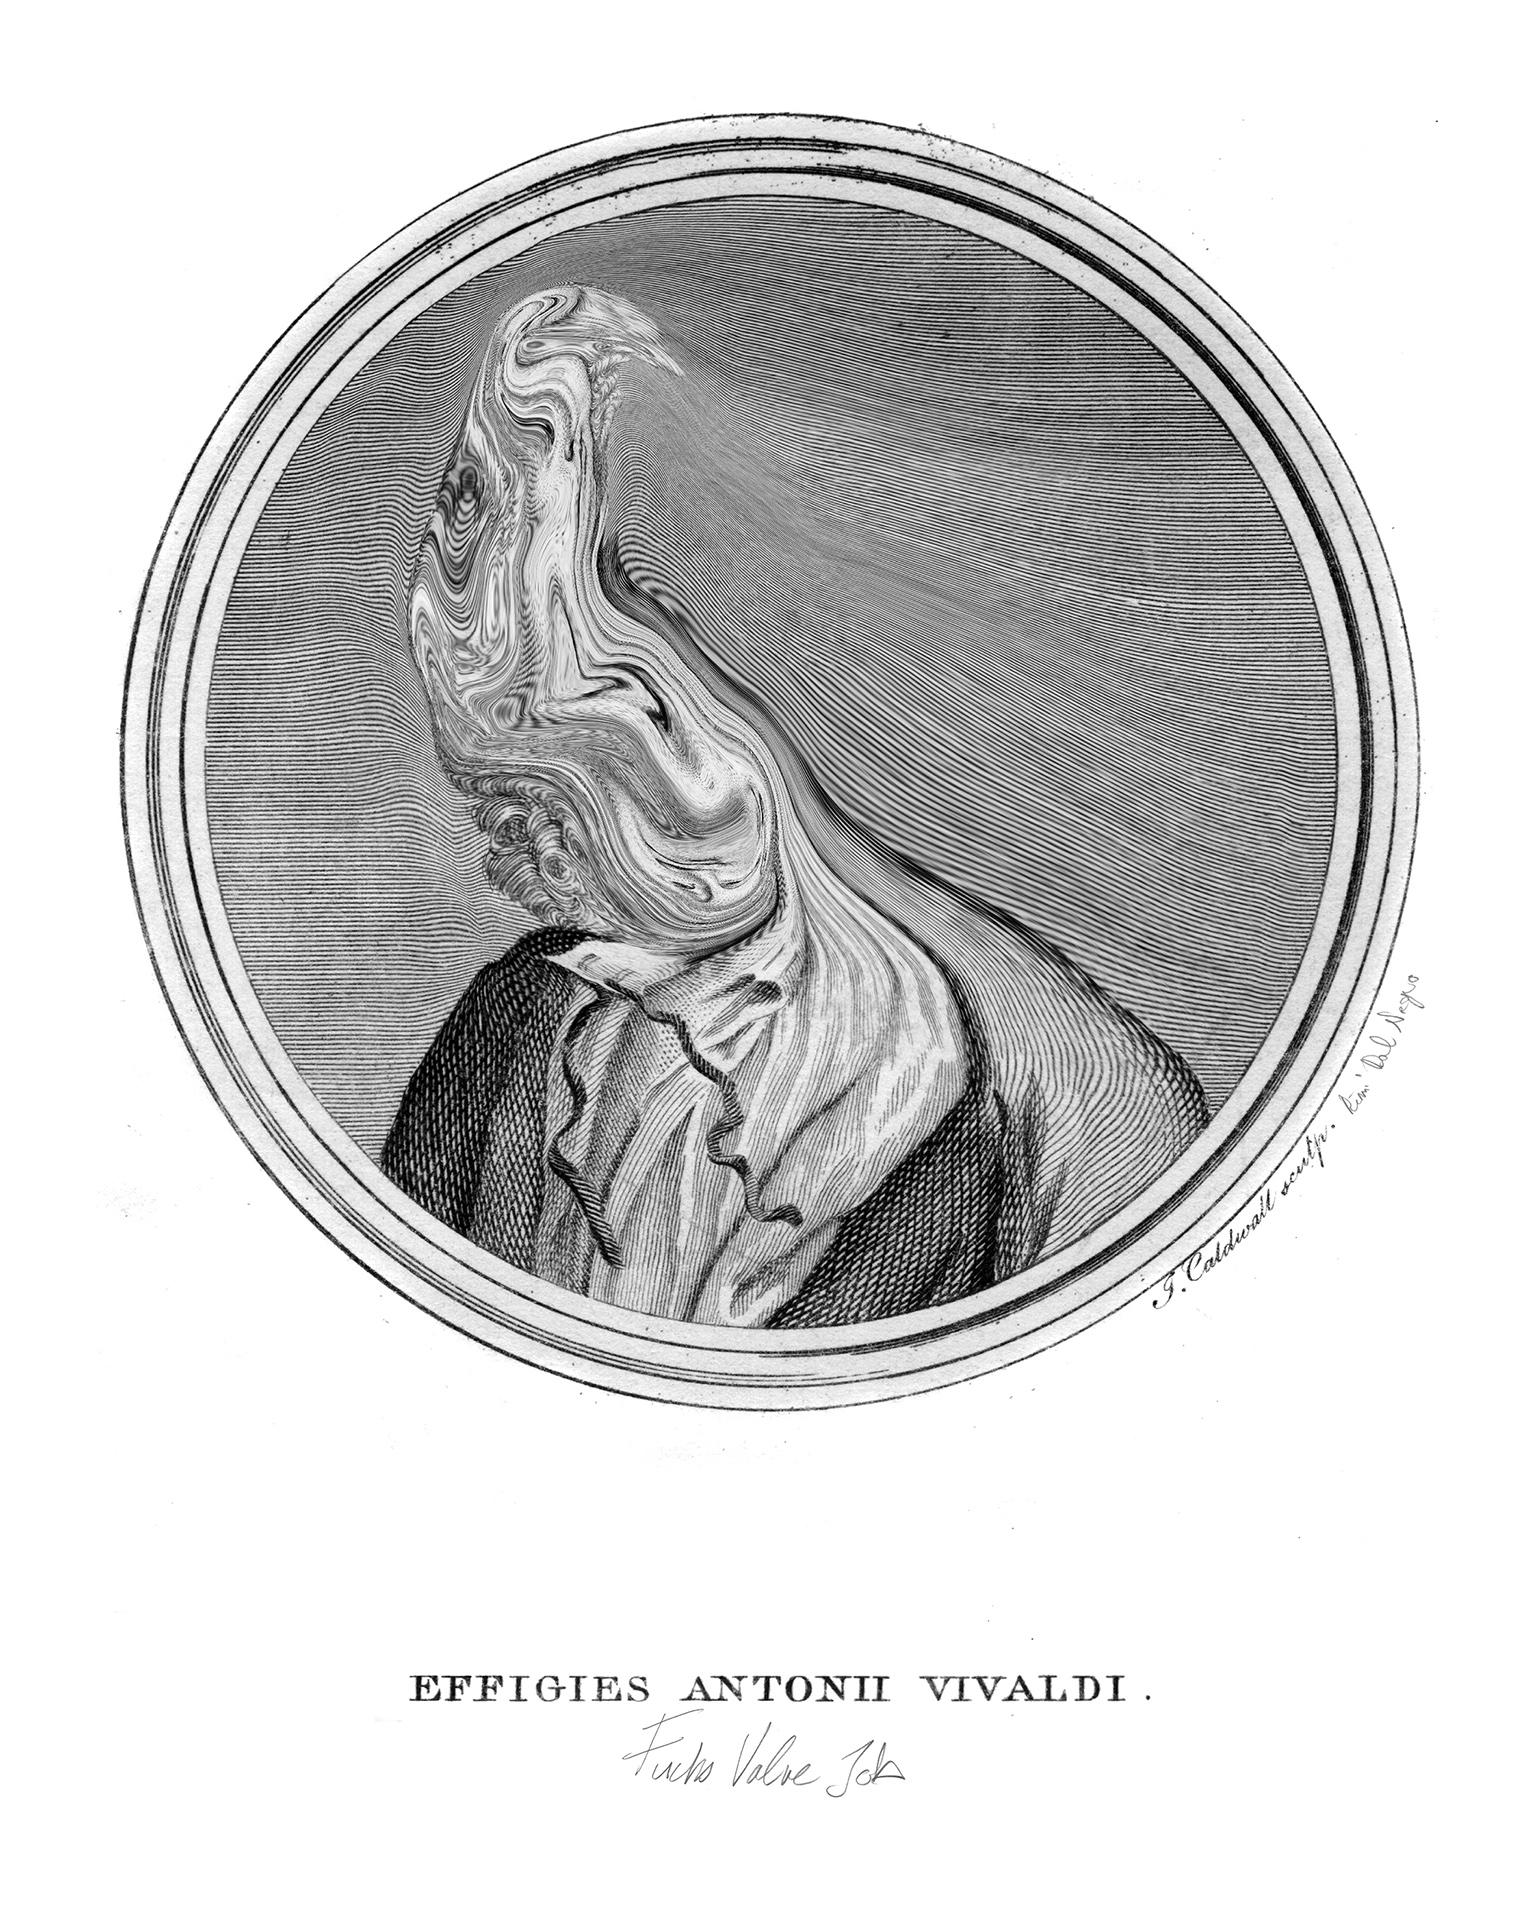 Effigies Antonii Vivaldi Fuchs Valve Job